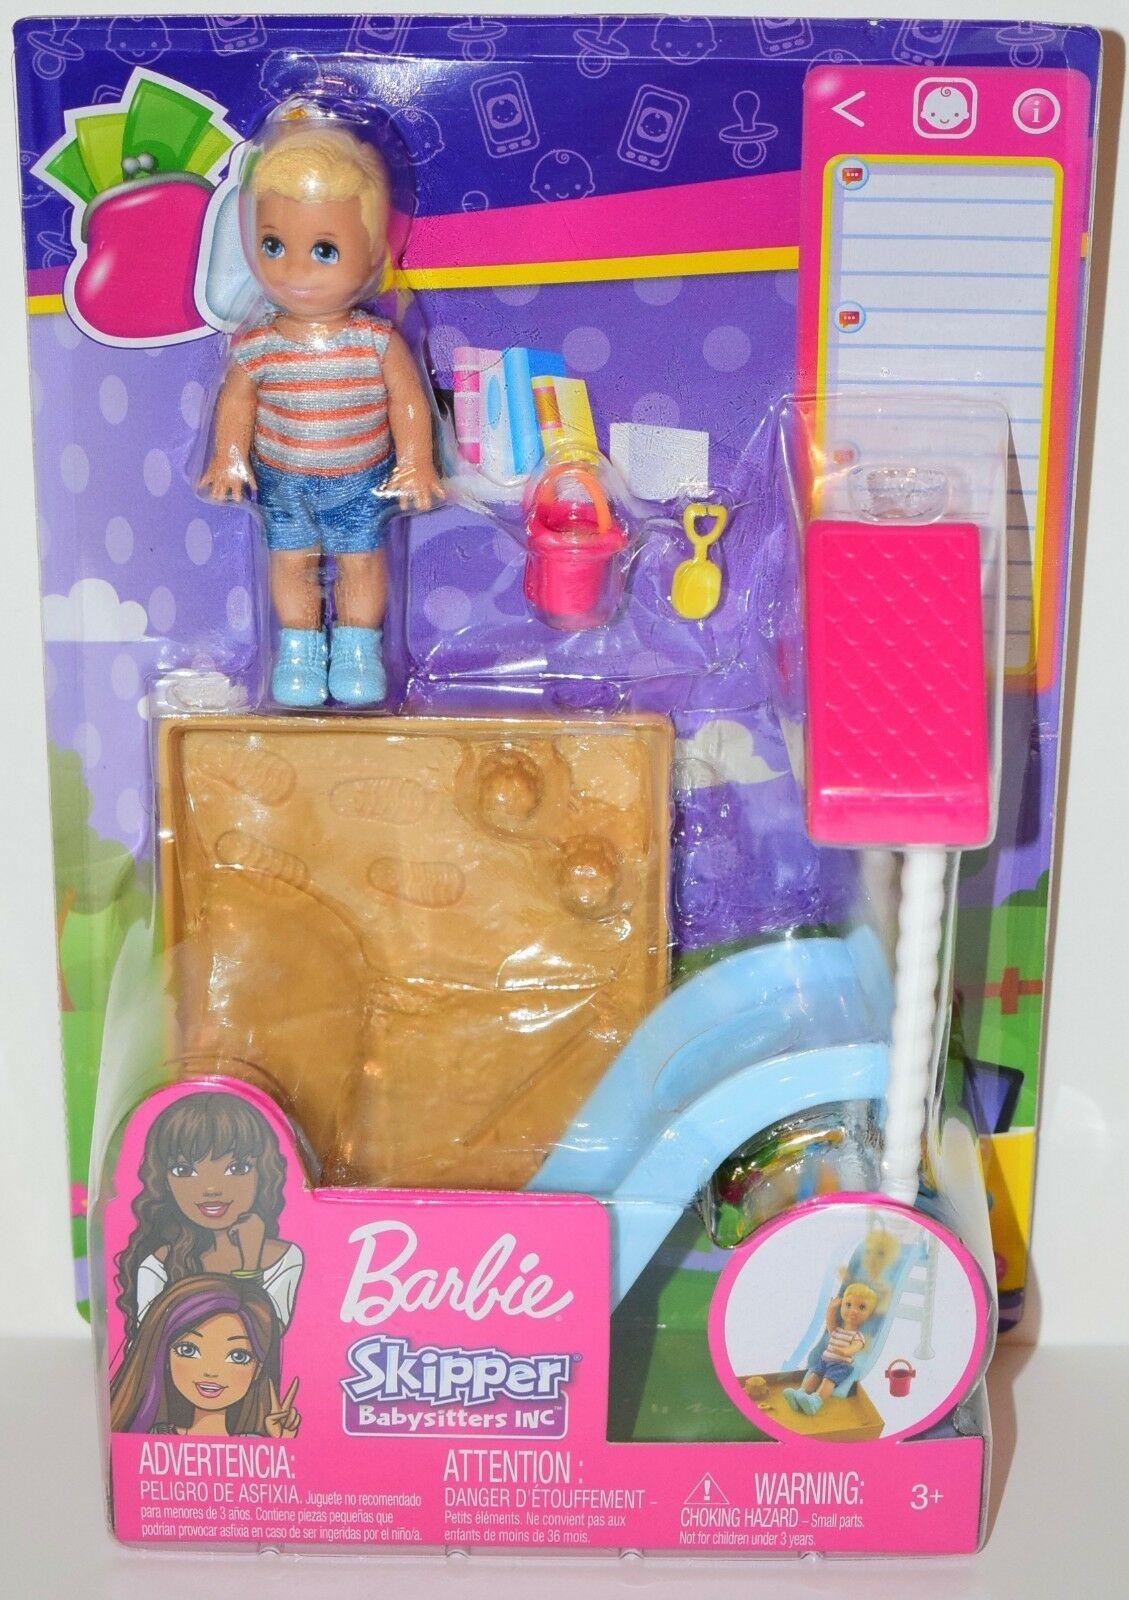 Barbie Skipper Babysitters Αξεσουάρ - 3 Σχέδια (FXG94)